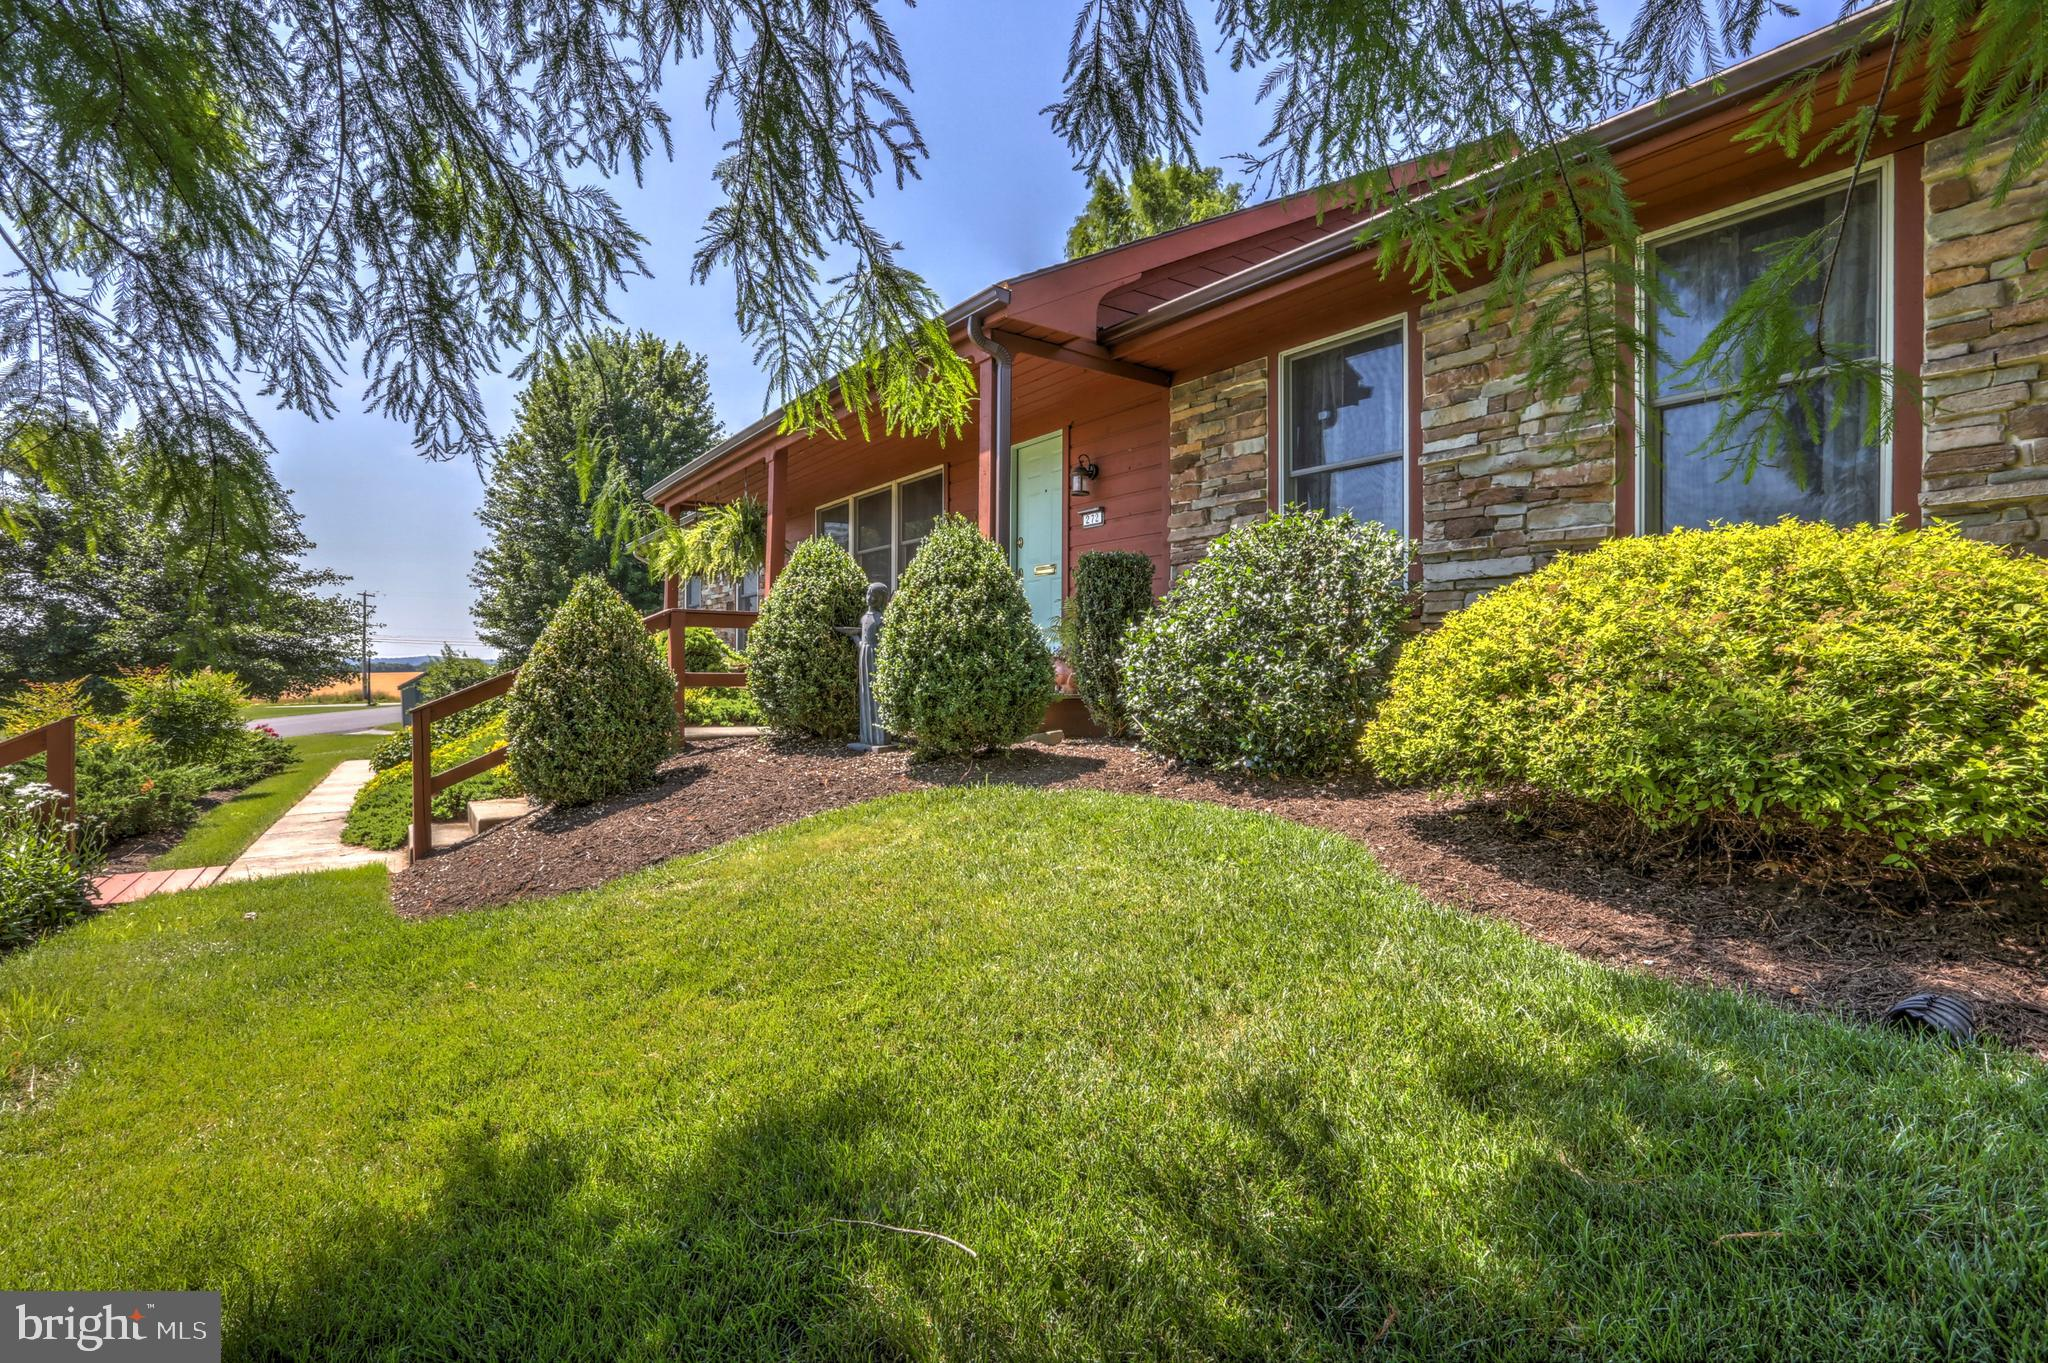 Residential for sale in MOUNT JOY, Pennsylvania, PALA135458